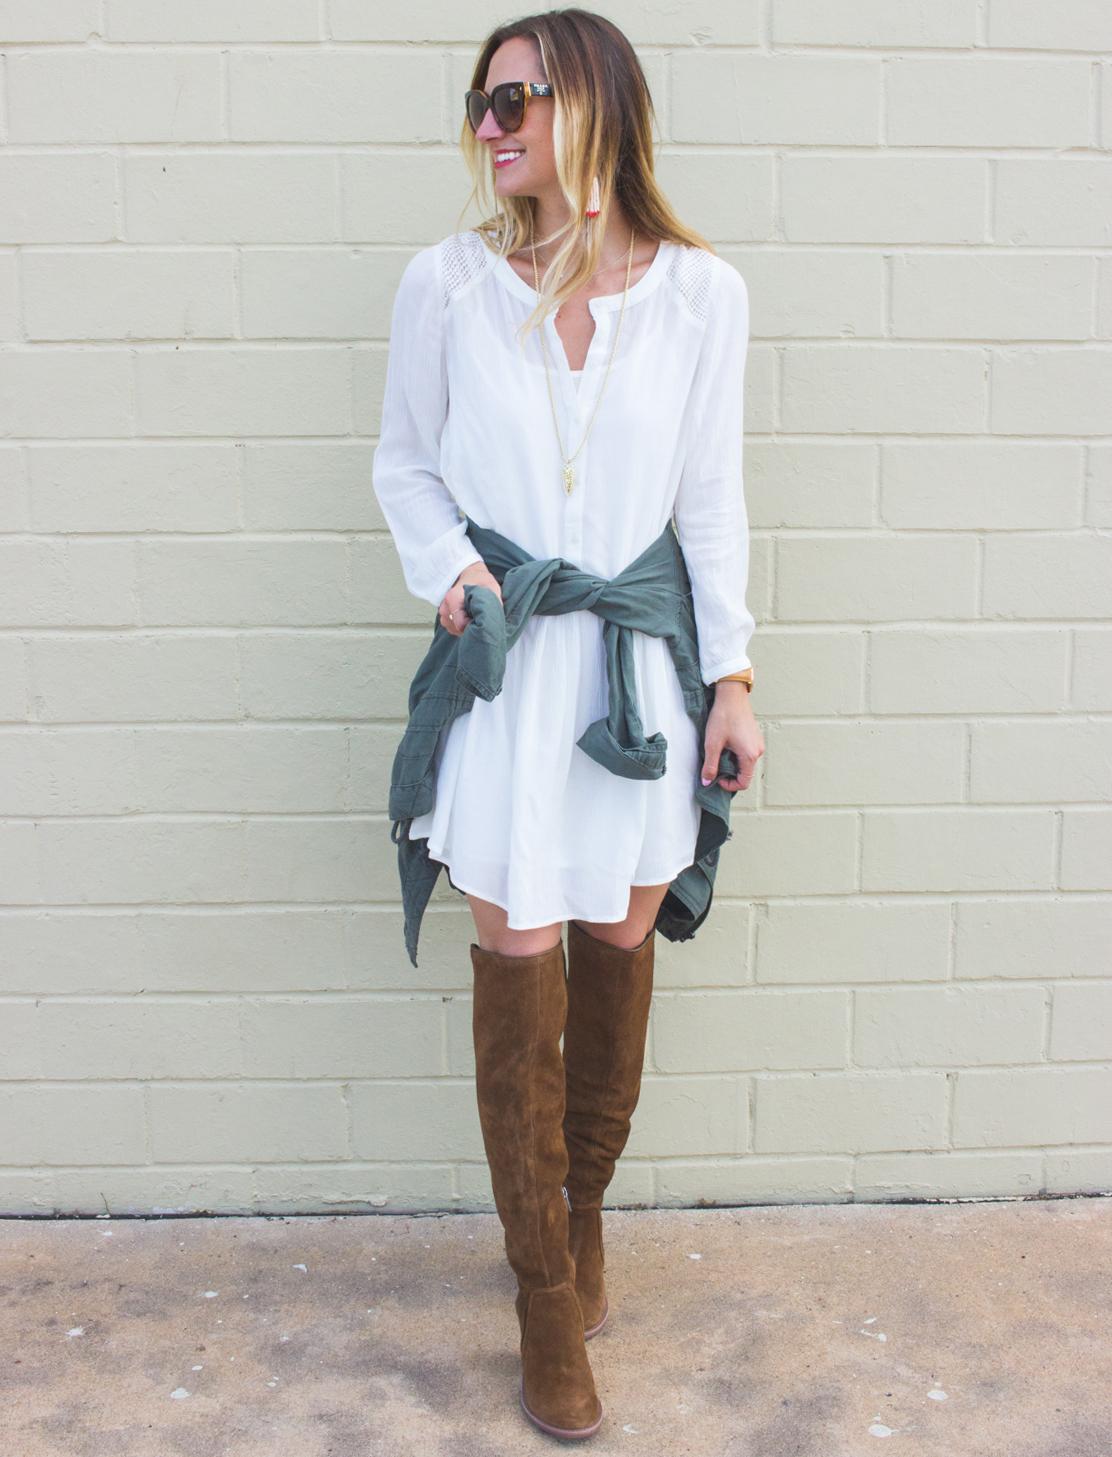 livvyland-blog-olivia-watson-fall-outfit-inspiration-drop-waist-white-dress-otk-boots-3